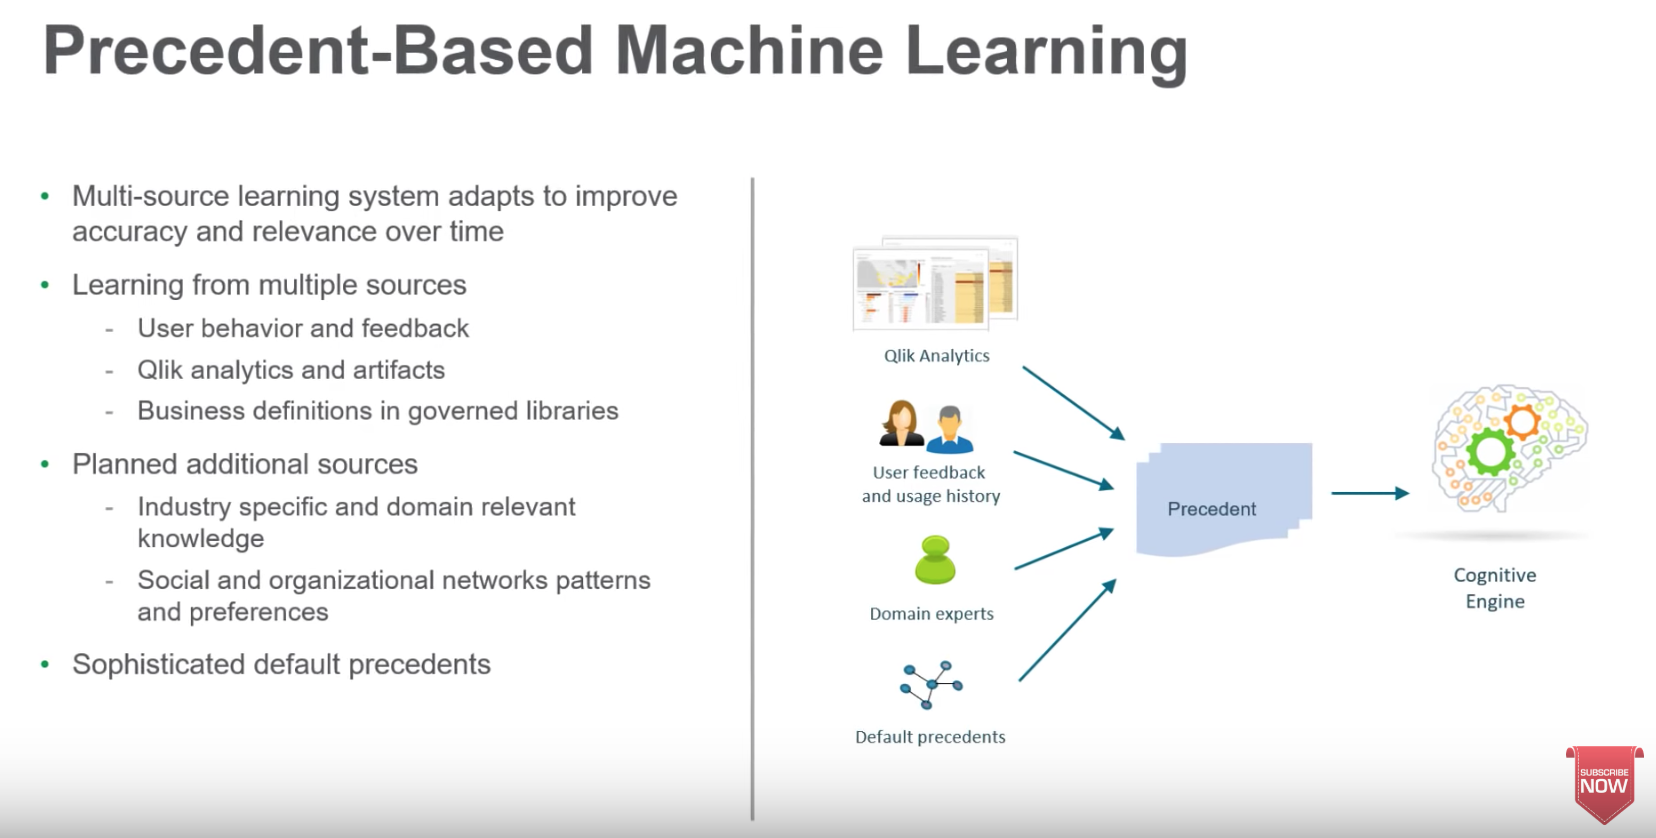 Next Steps for Qlik's Insight Advisor and Cognitive Engine